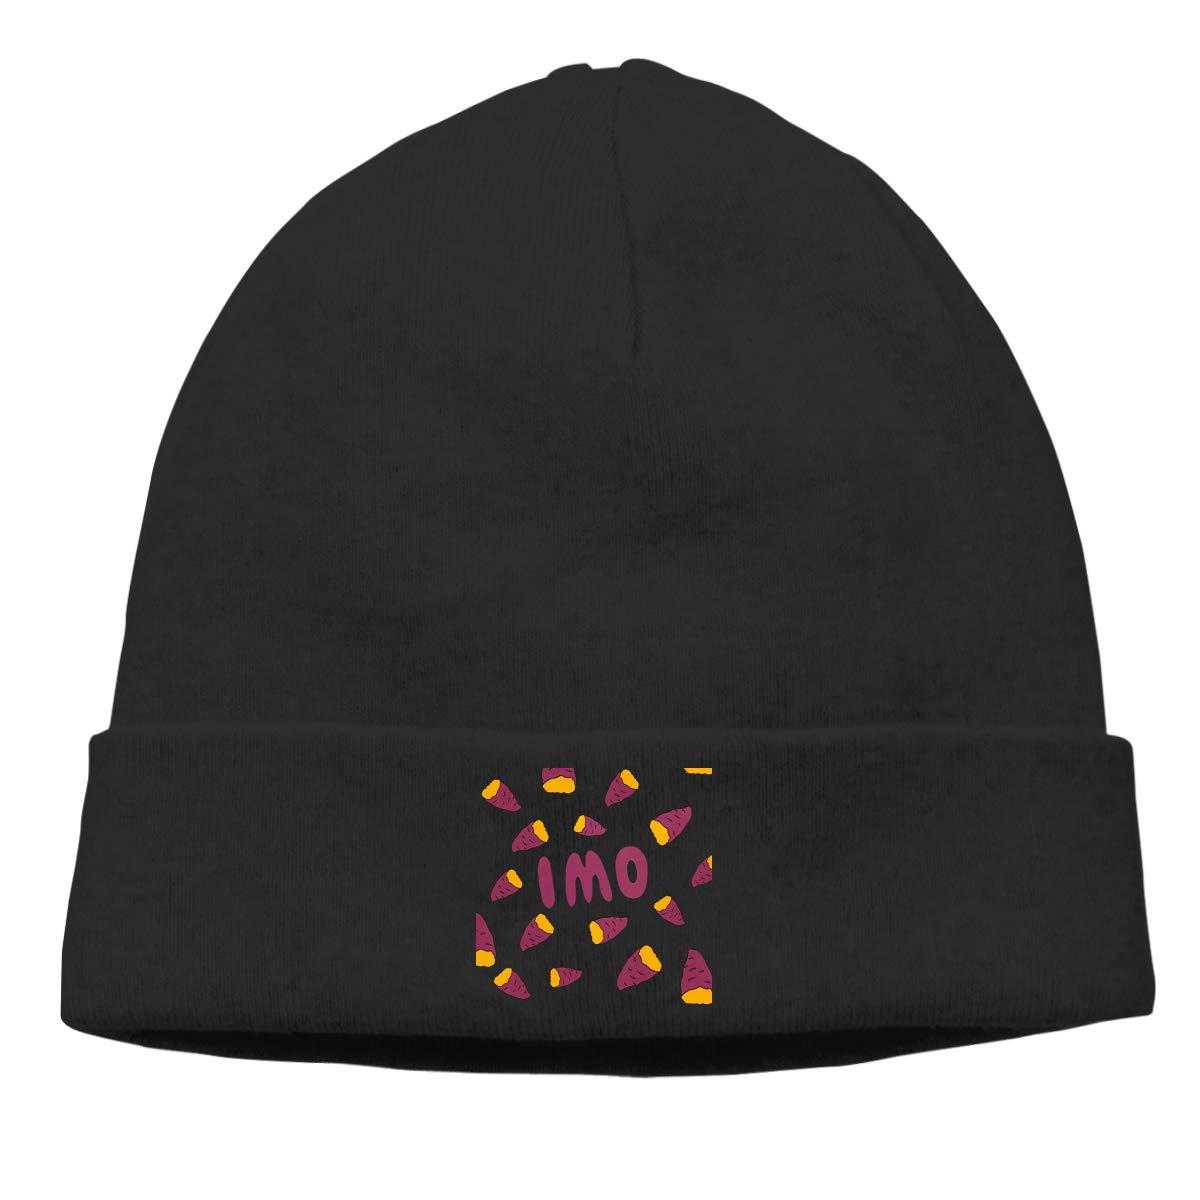 Nskngr Sweet Potato Cap Unisex Cuffed Oversized Baggy Knit Hat Cap Ski Slouchy Hat